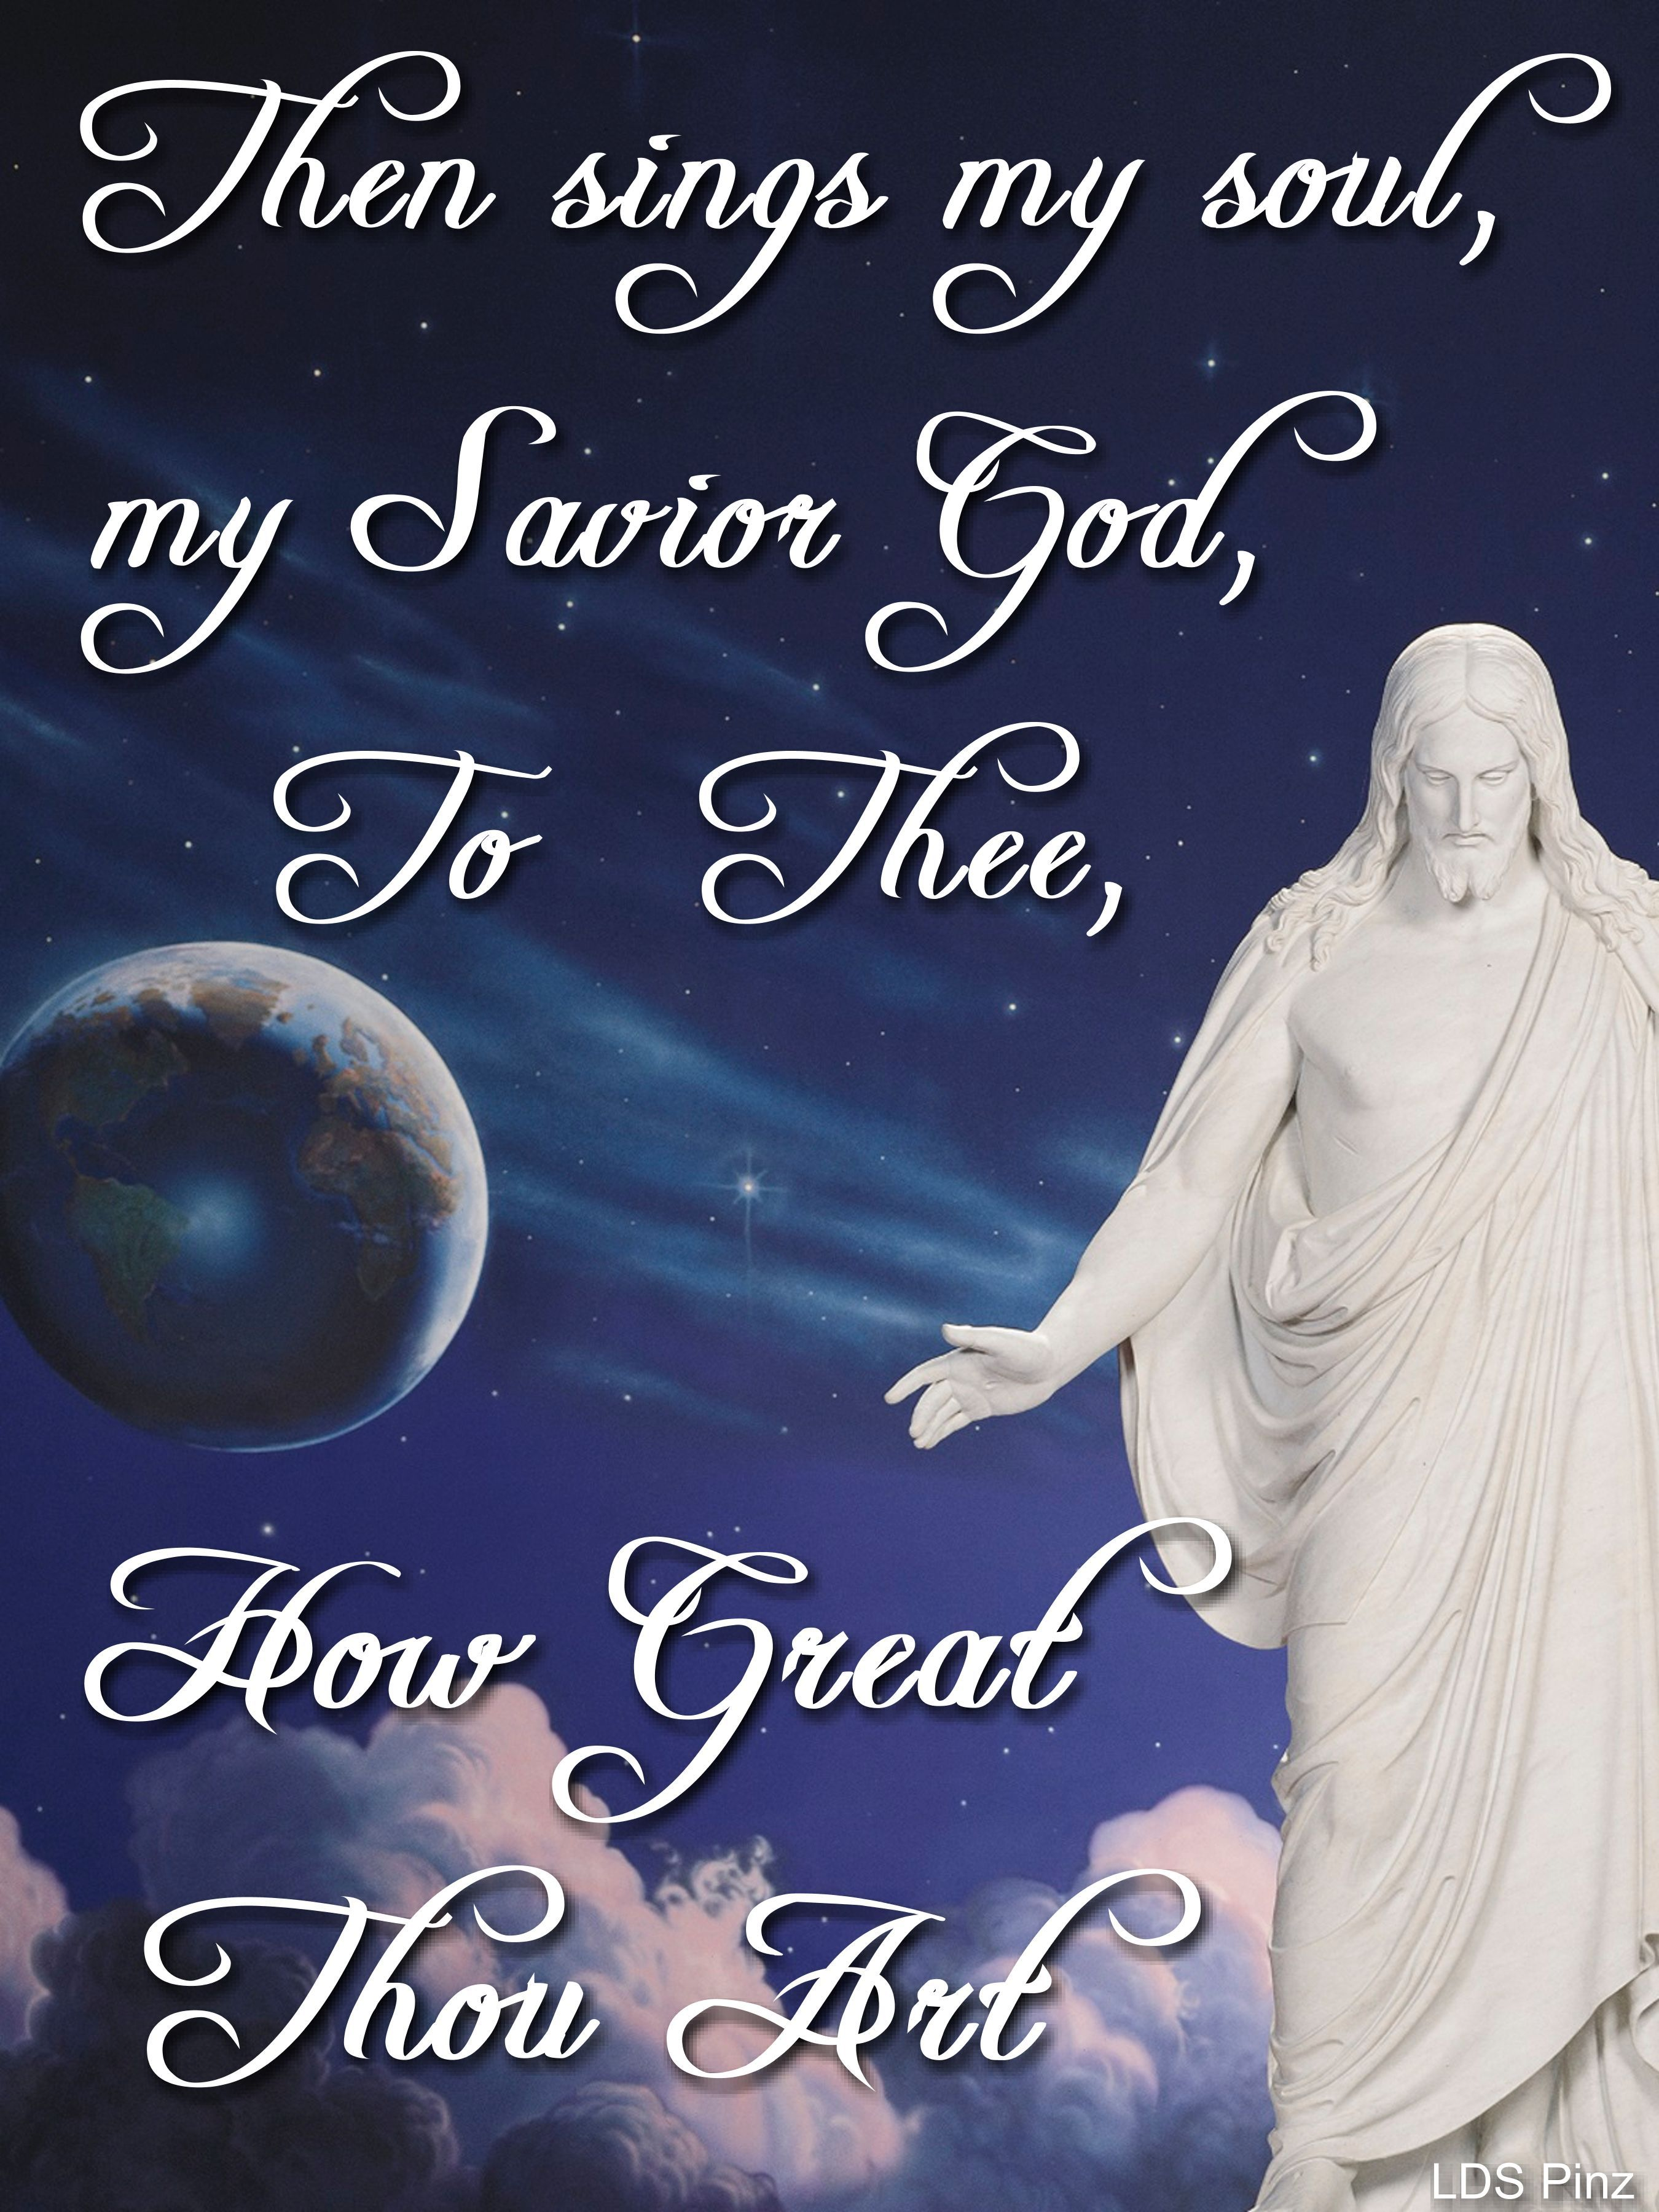 How great thou art lds hymns faith inspiration then